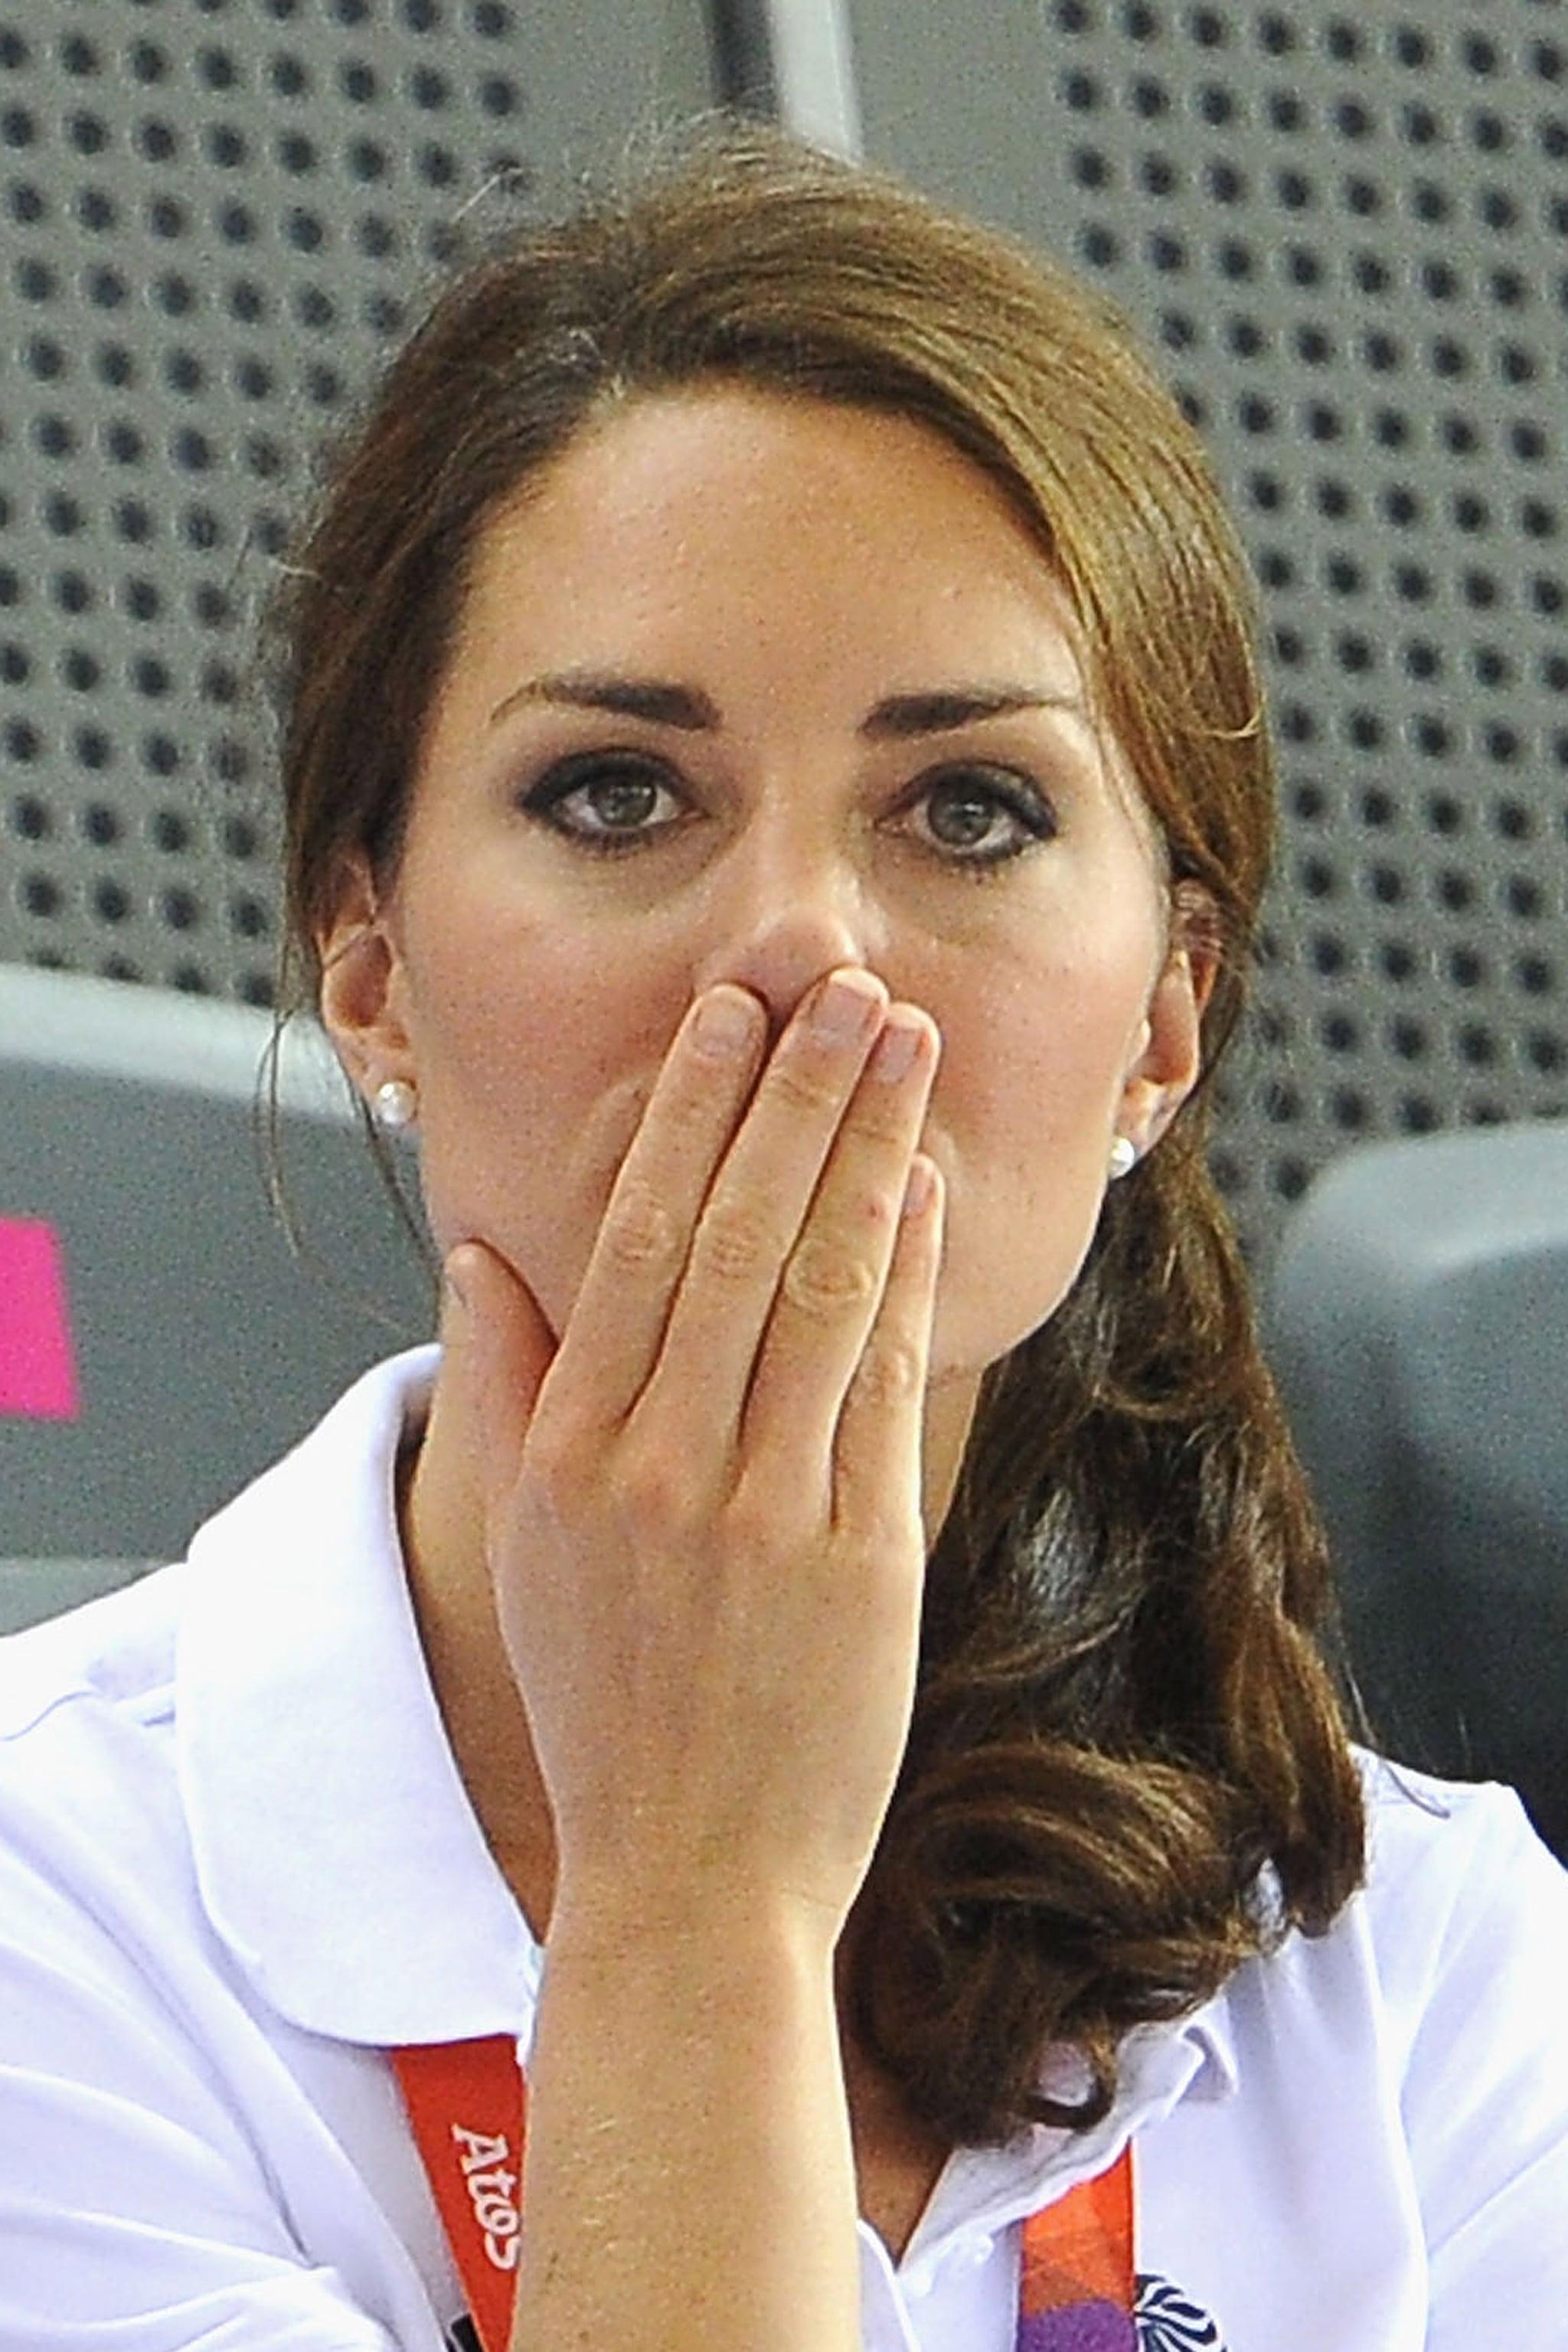 """I think I left the oven on. What if I Burn down Kensington Palace?!"""